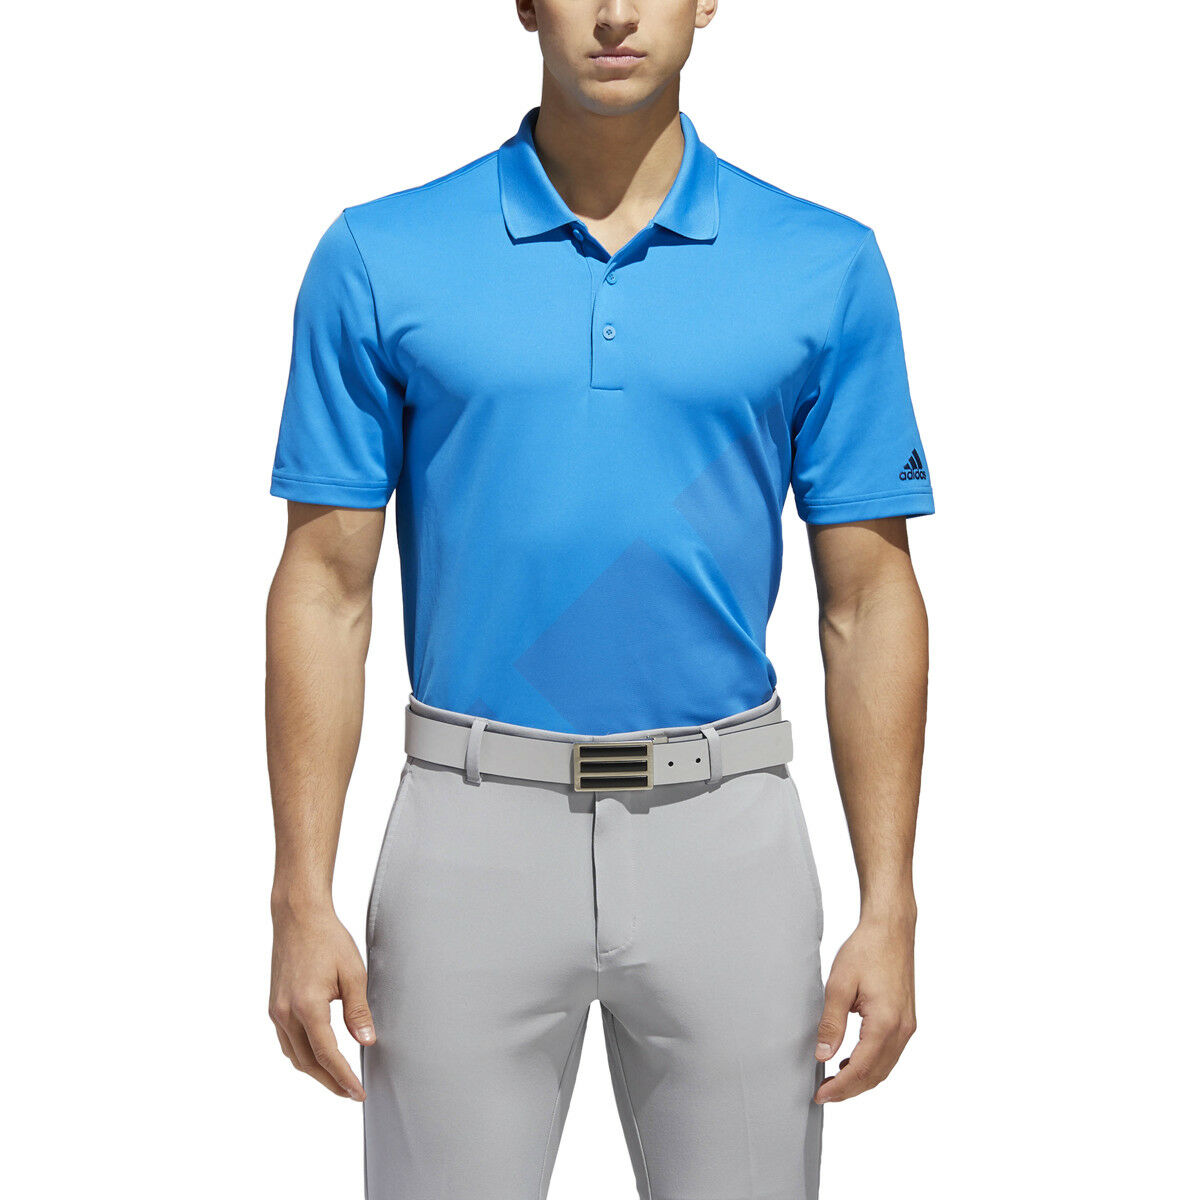 New 2018 Adidas Bold 3-Stripes Golf Bright Blue Polo Shirt Medium (M)